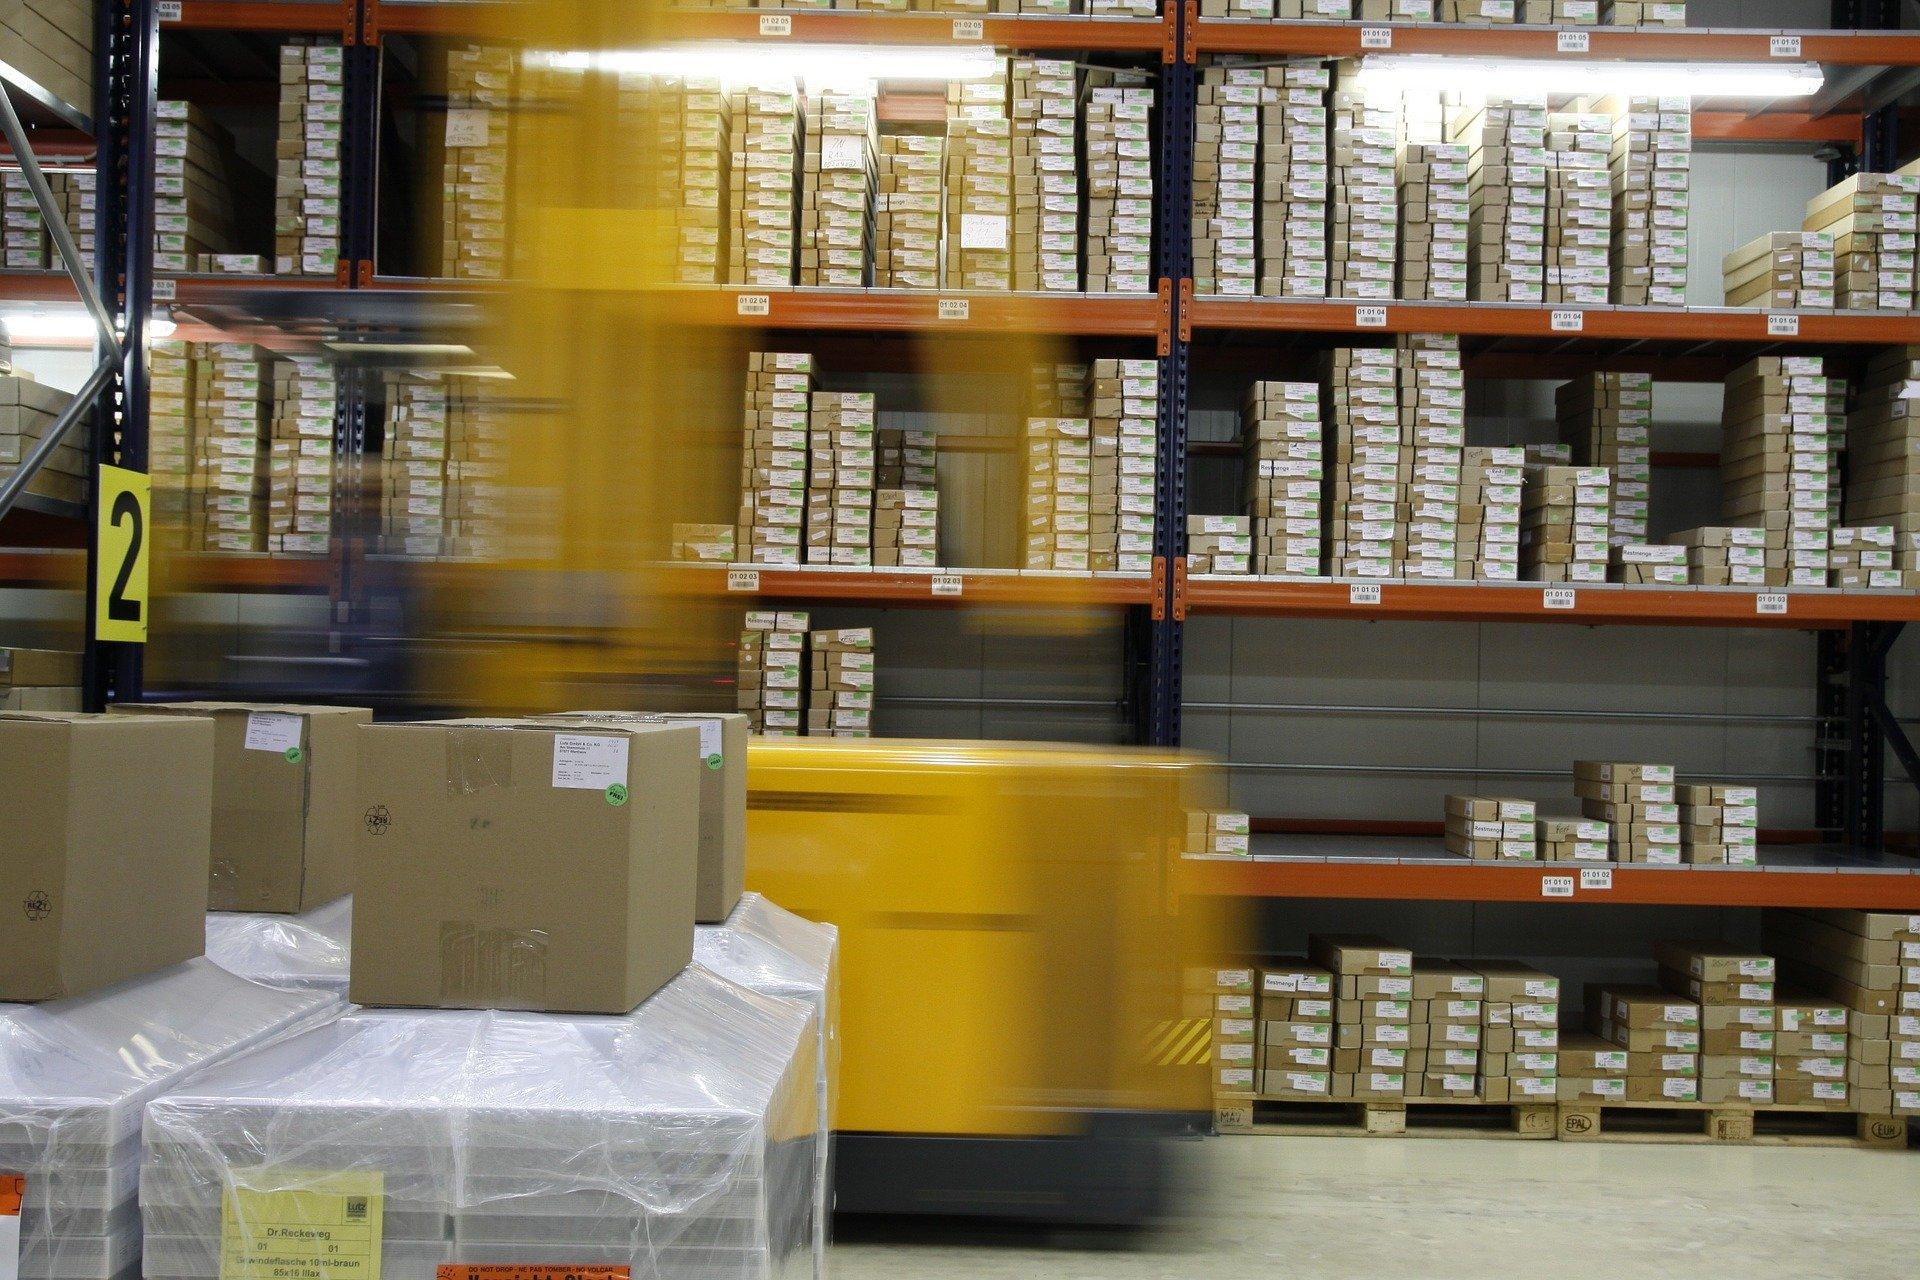 Aje Intralogistik Unternehmen Anbieter Software Hardware Beratung Industrie Logistikloesung Lagerverwaltung